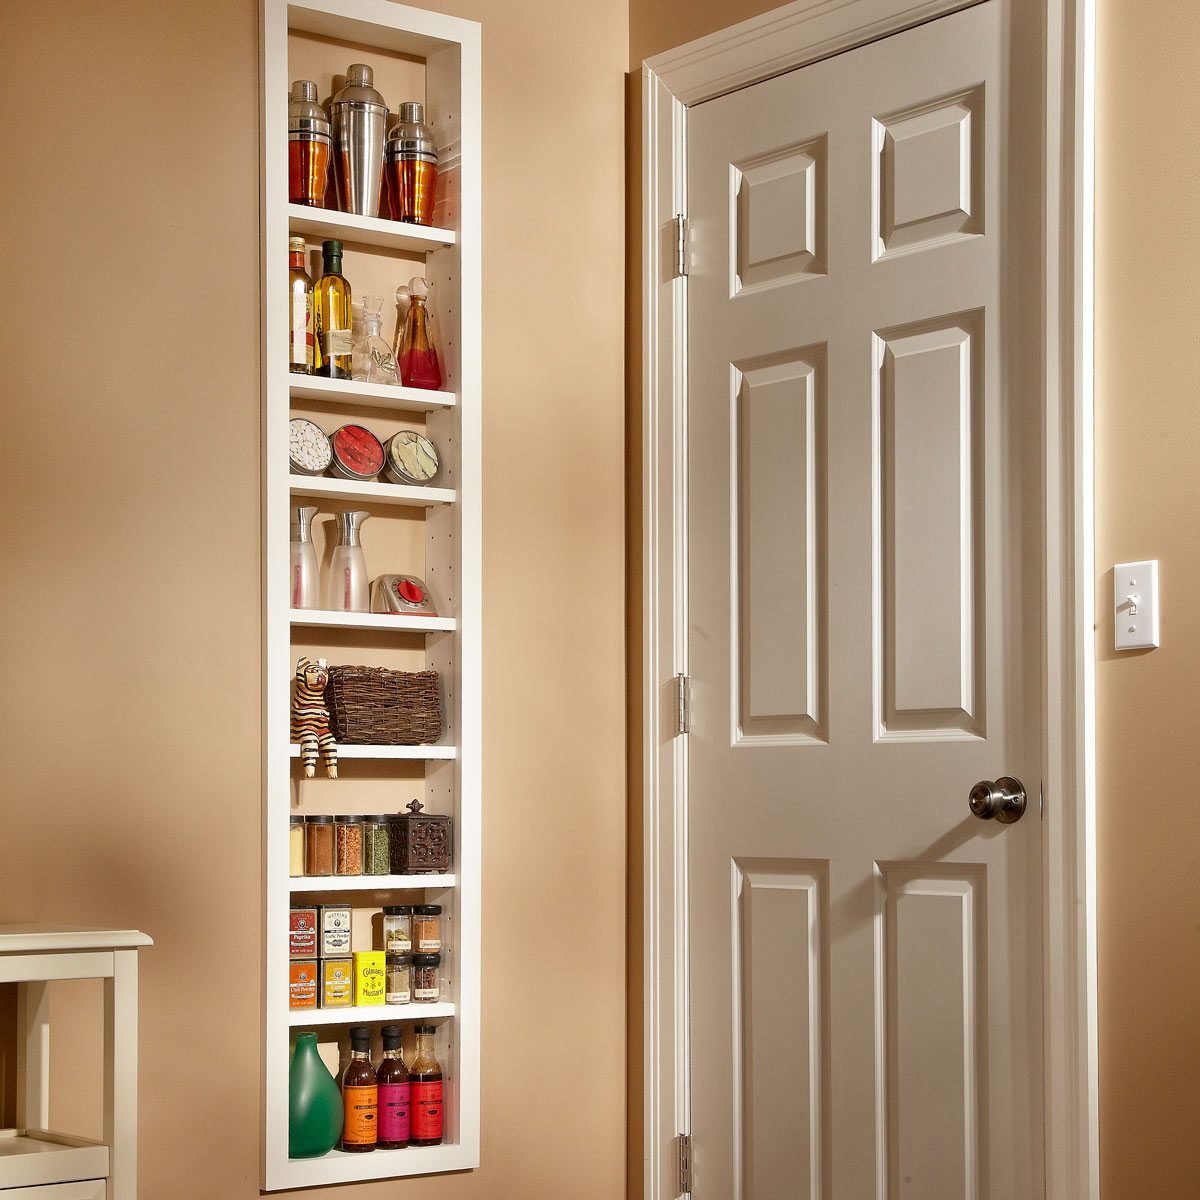 Make Your Own Built-In Shelves